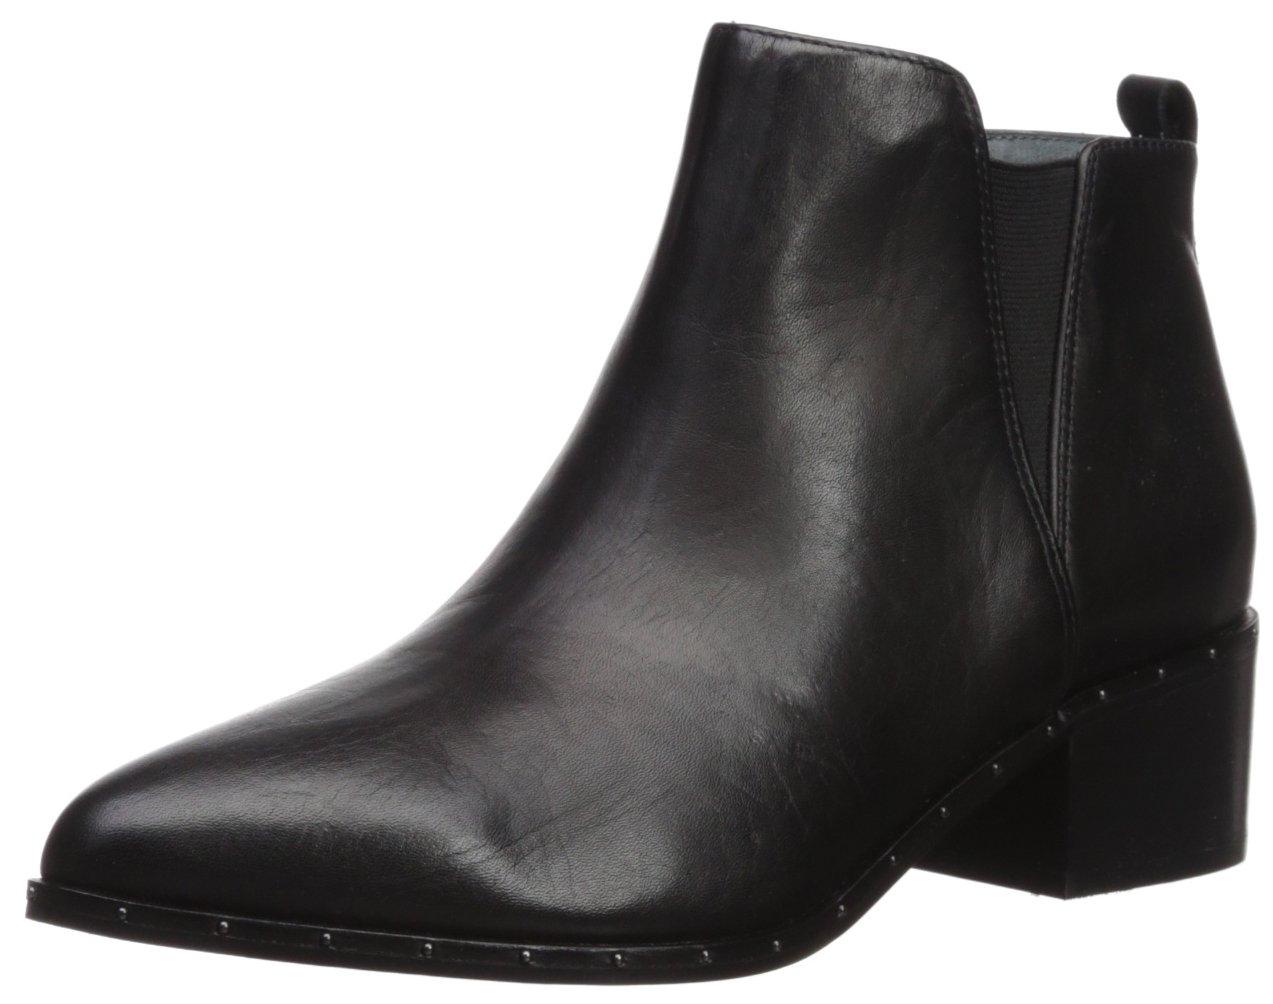 Carlos by Carlos Santana Women's Ginger Ankle Boot, Black, 8.5 Medium US